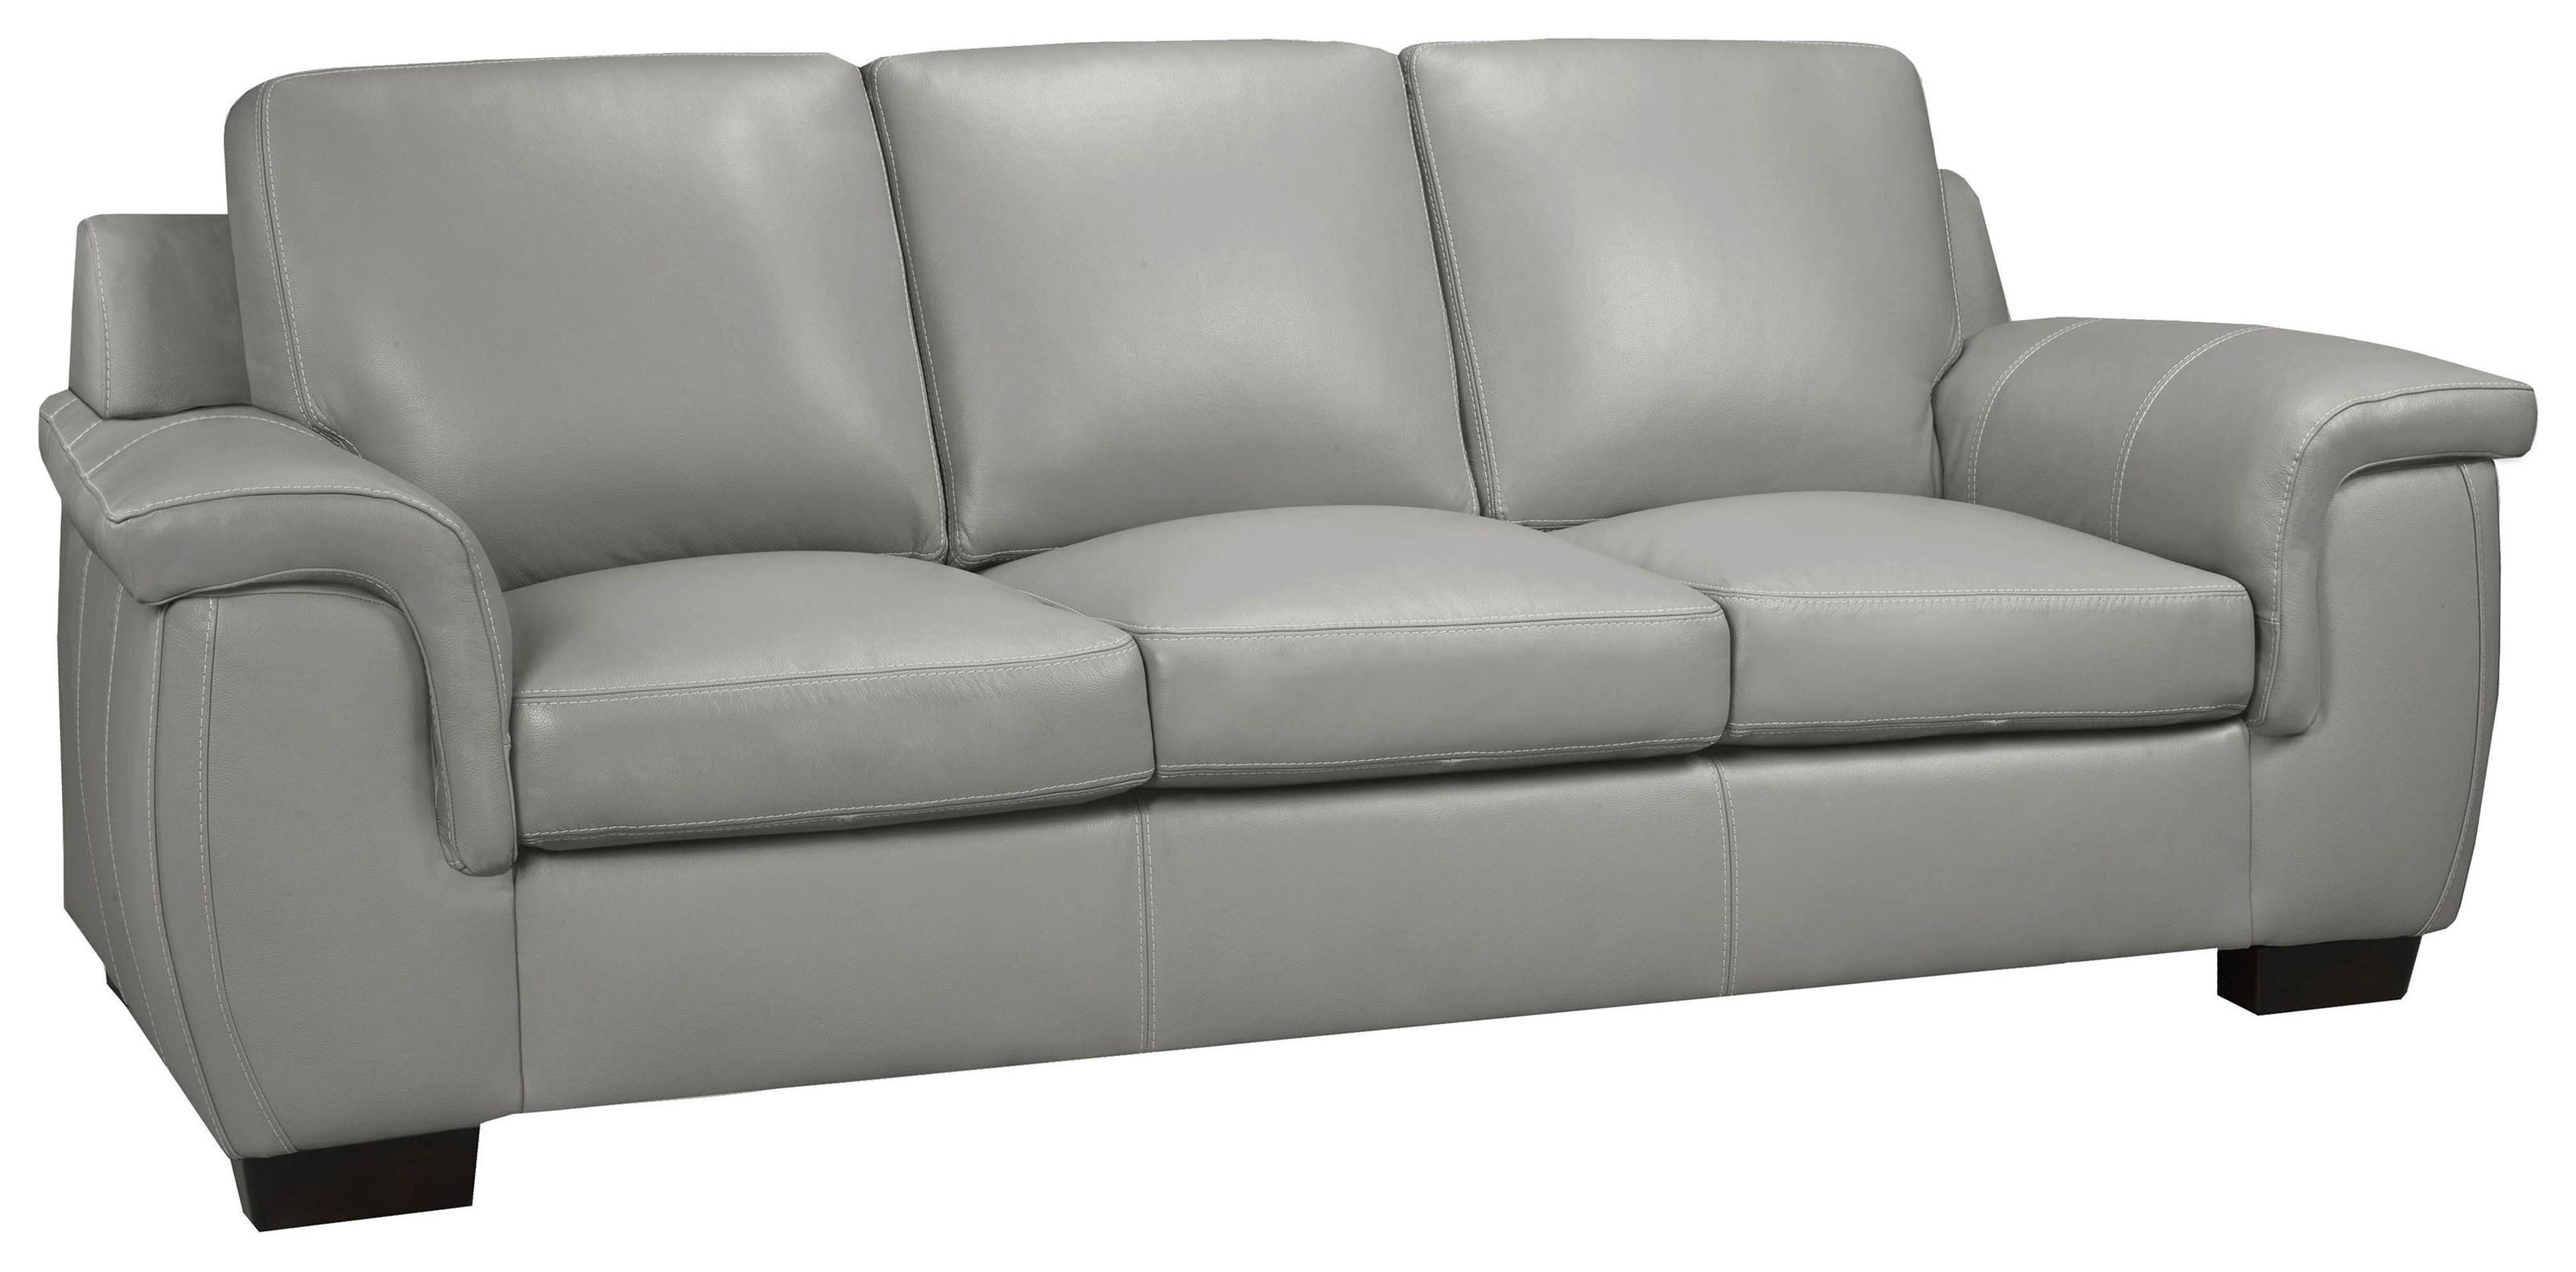 Brisbane Brisbane Lthr Sofa /cloud Gray by Leather Living at Stoney Creek Furniture